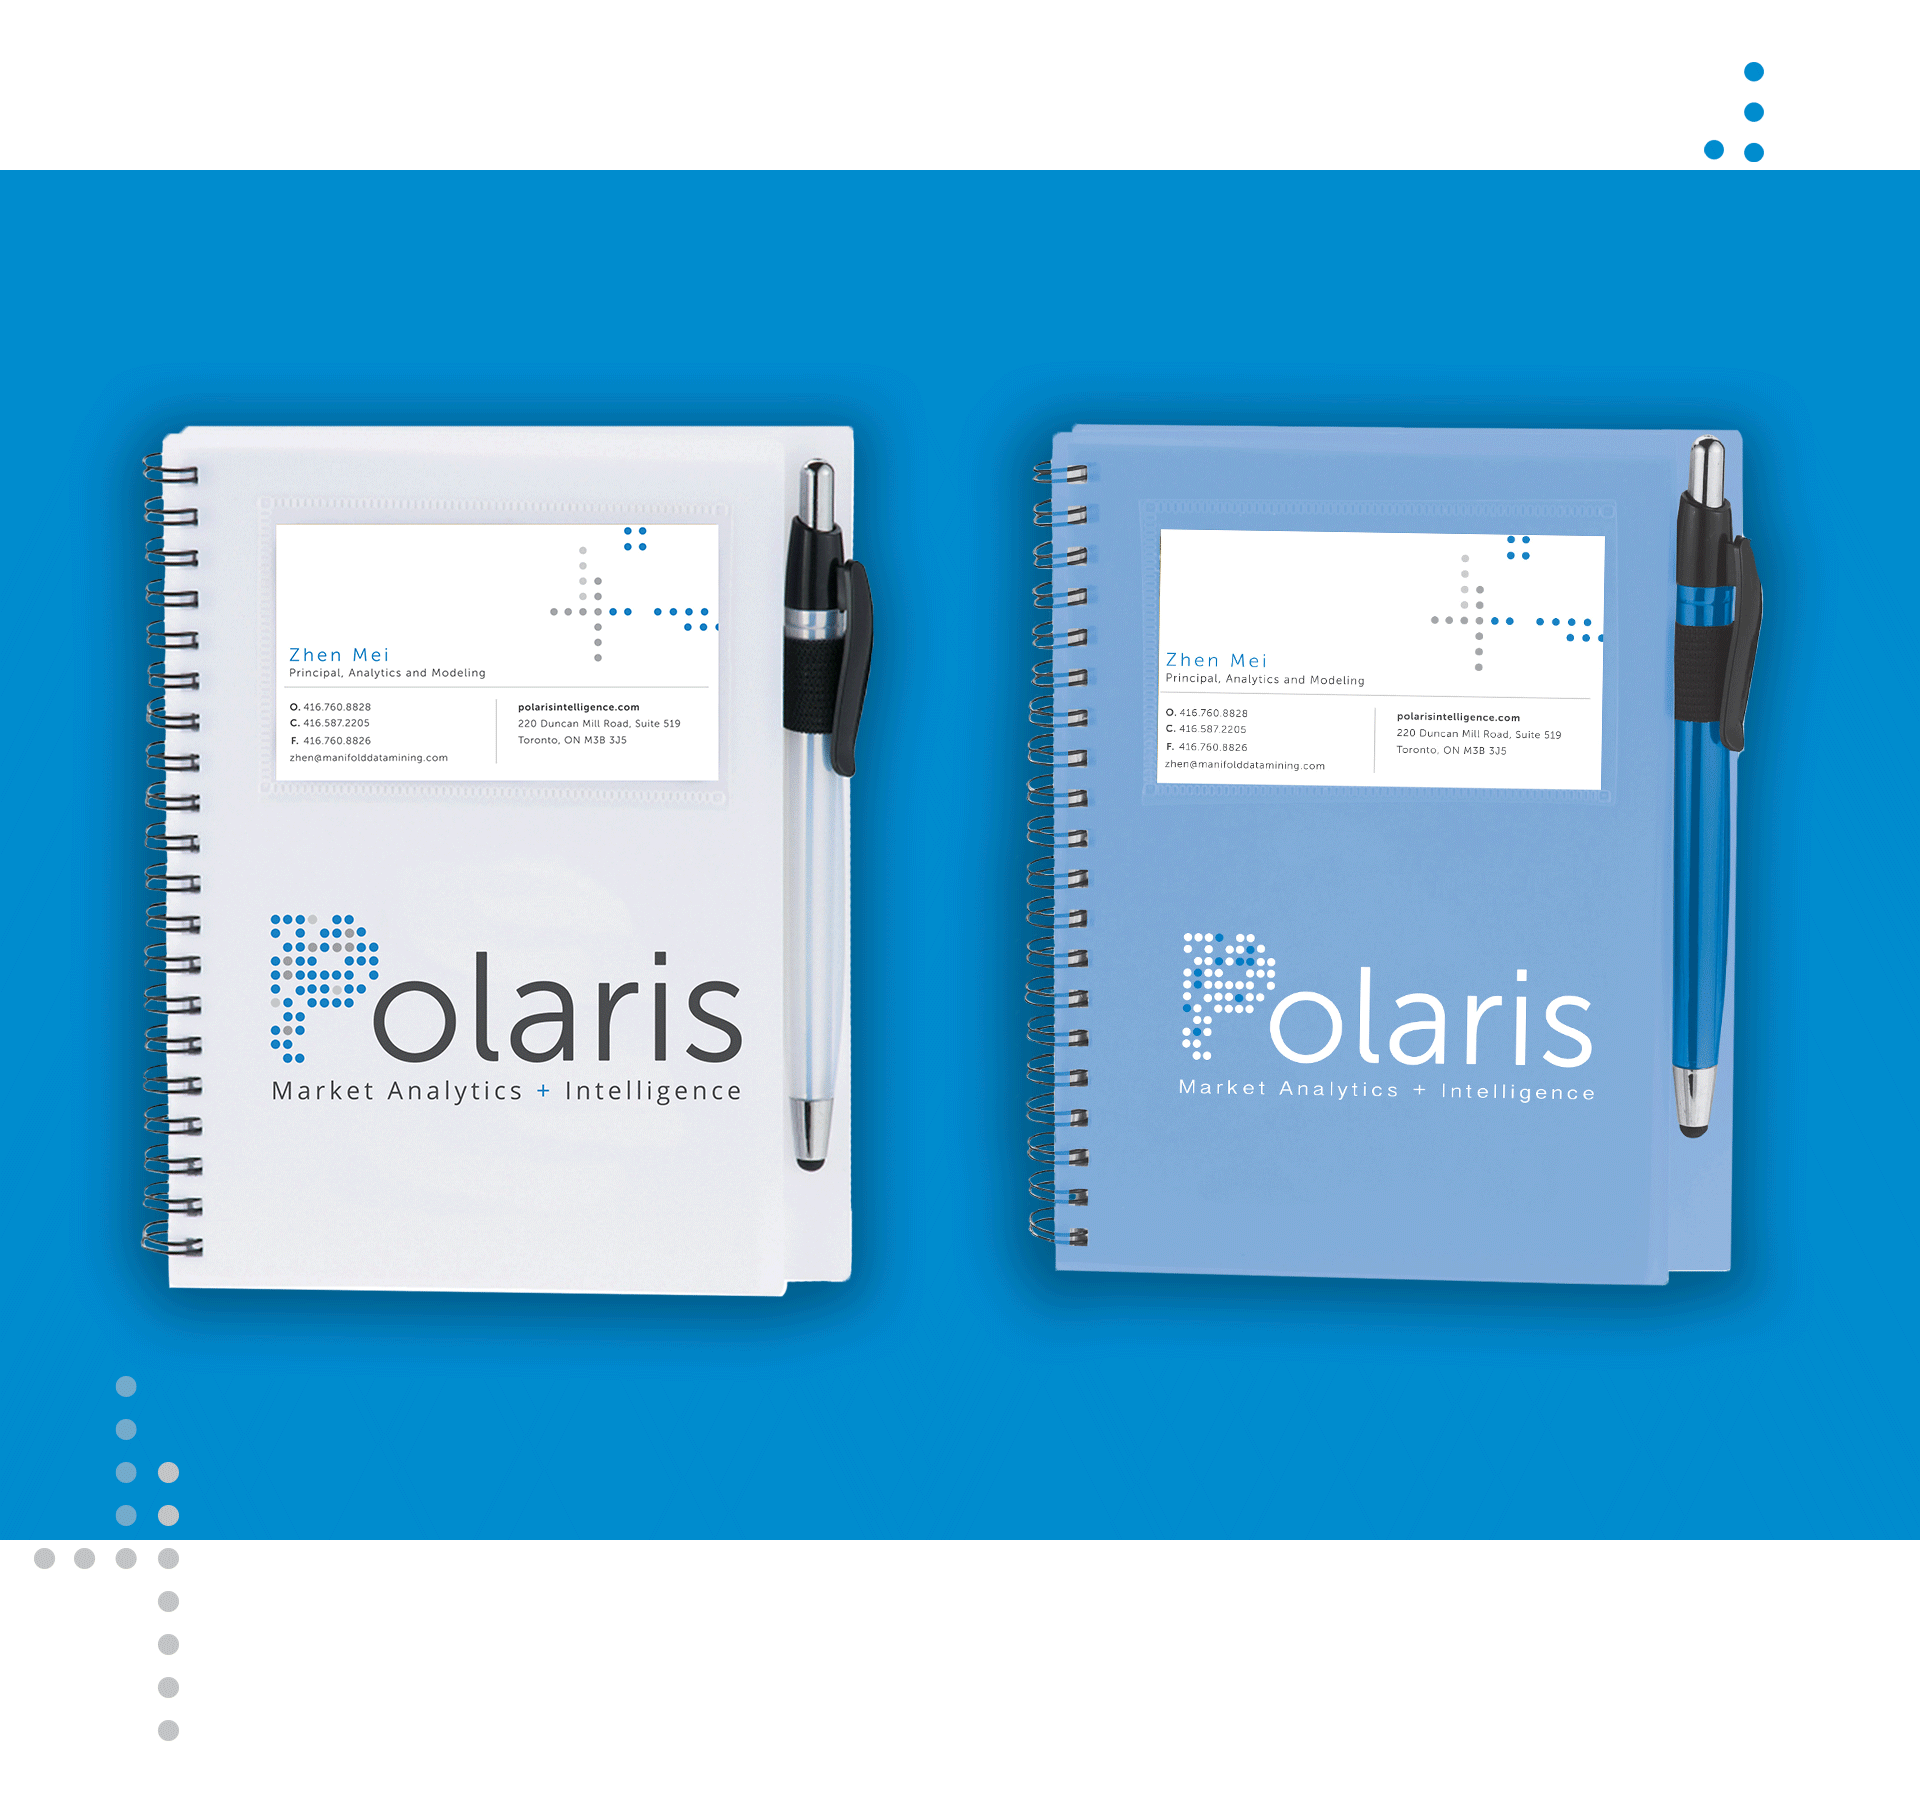 7-polaris-brand